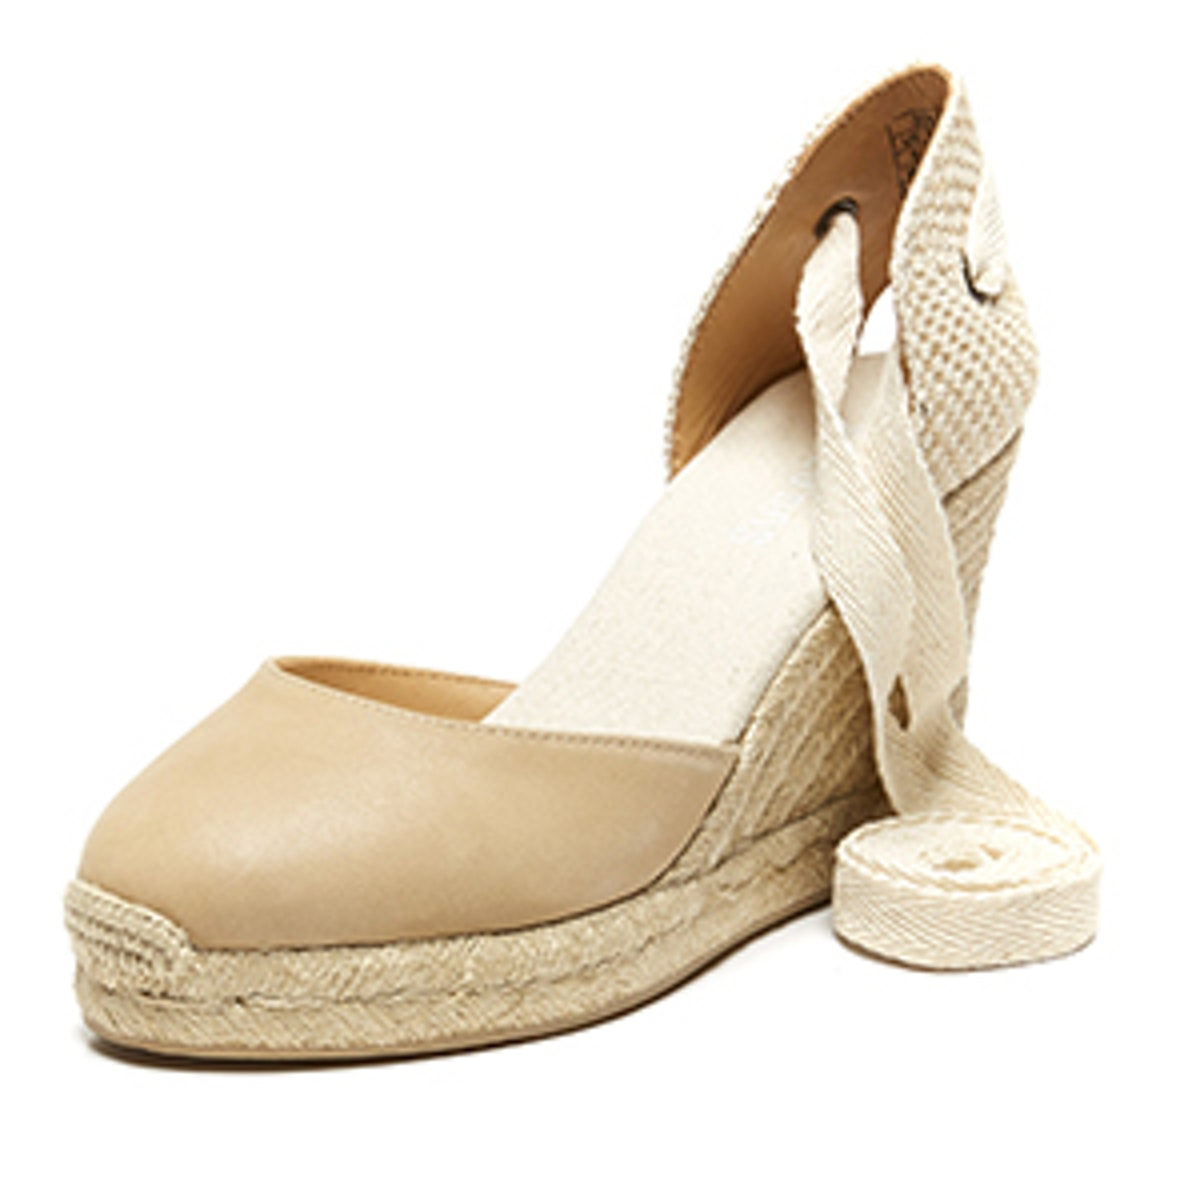 Tall Leather Espadrille Wedge Sandal